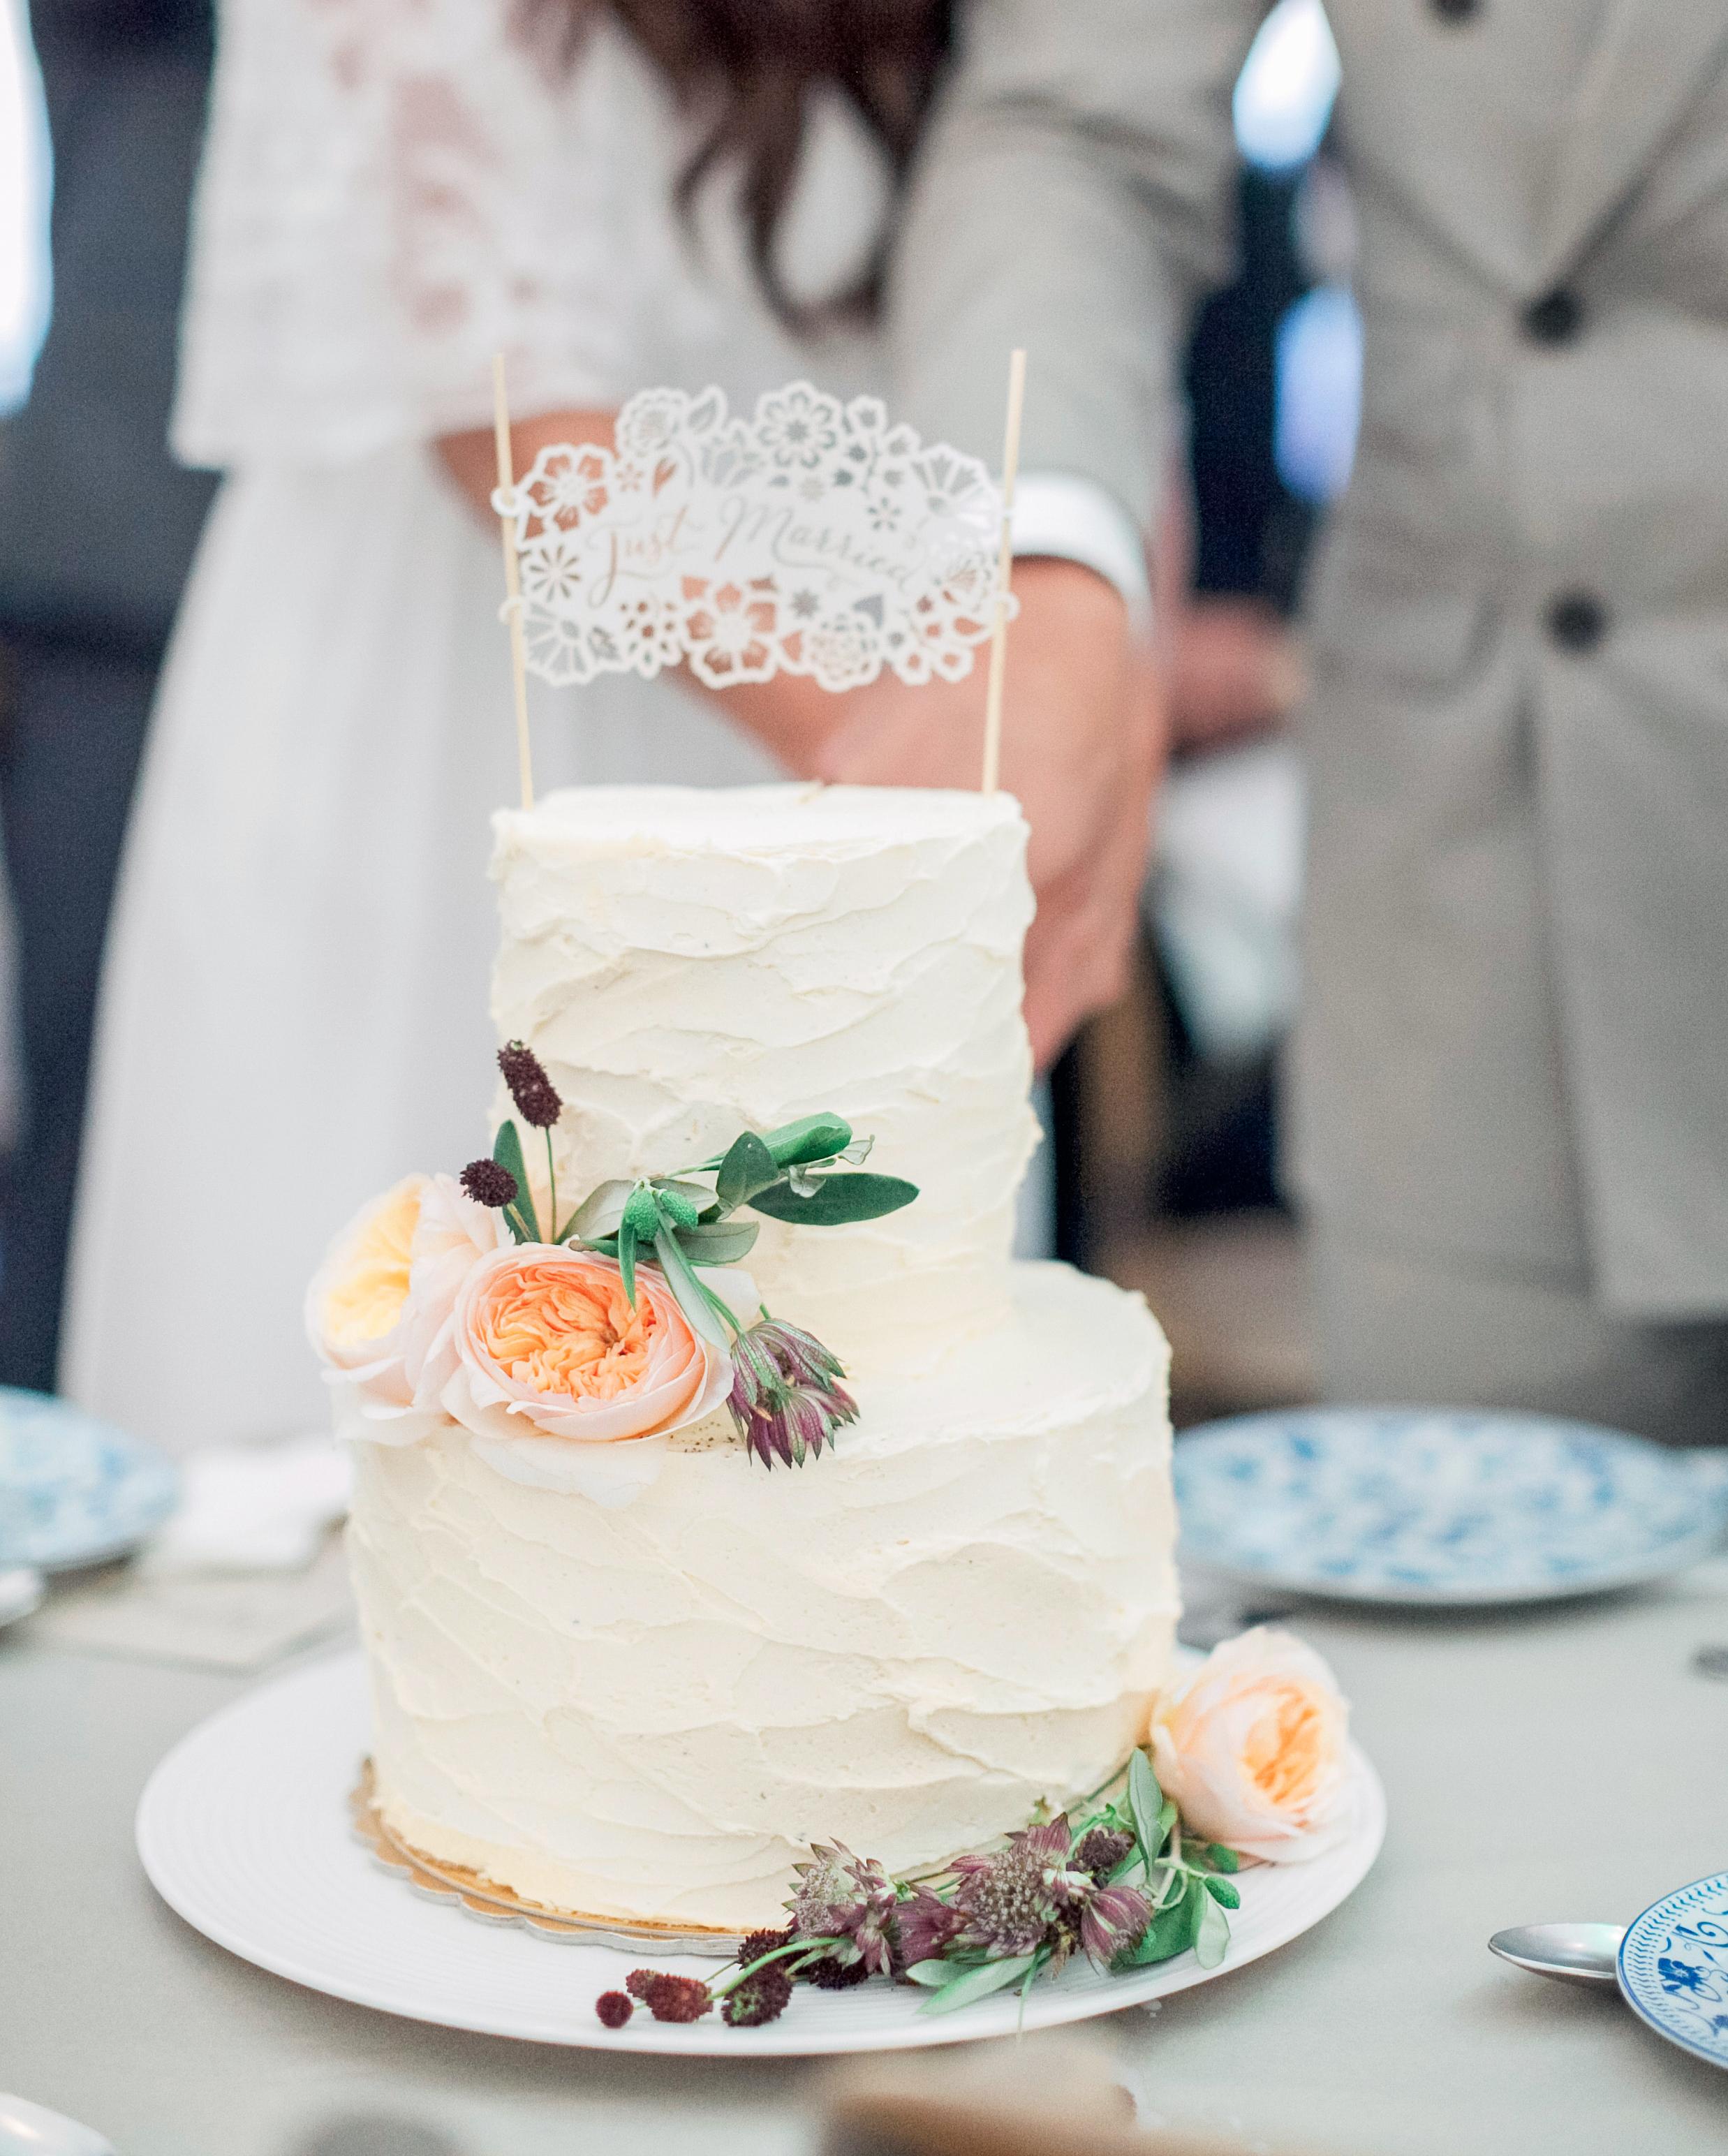 negin-chris-wedding-cake-0815-s112116-0815.jpg